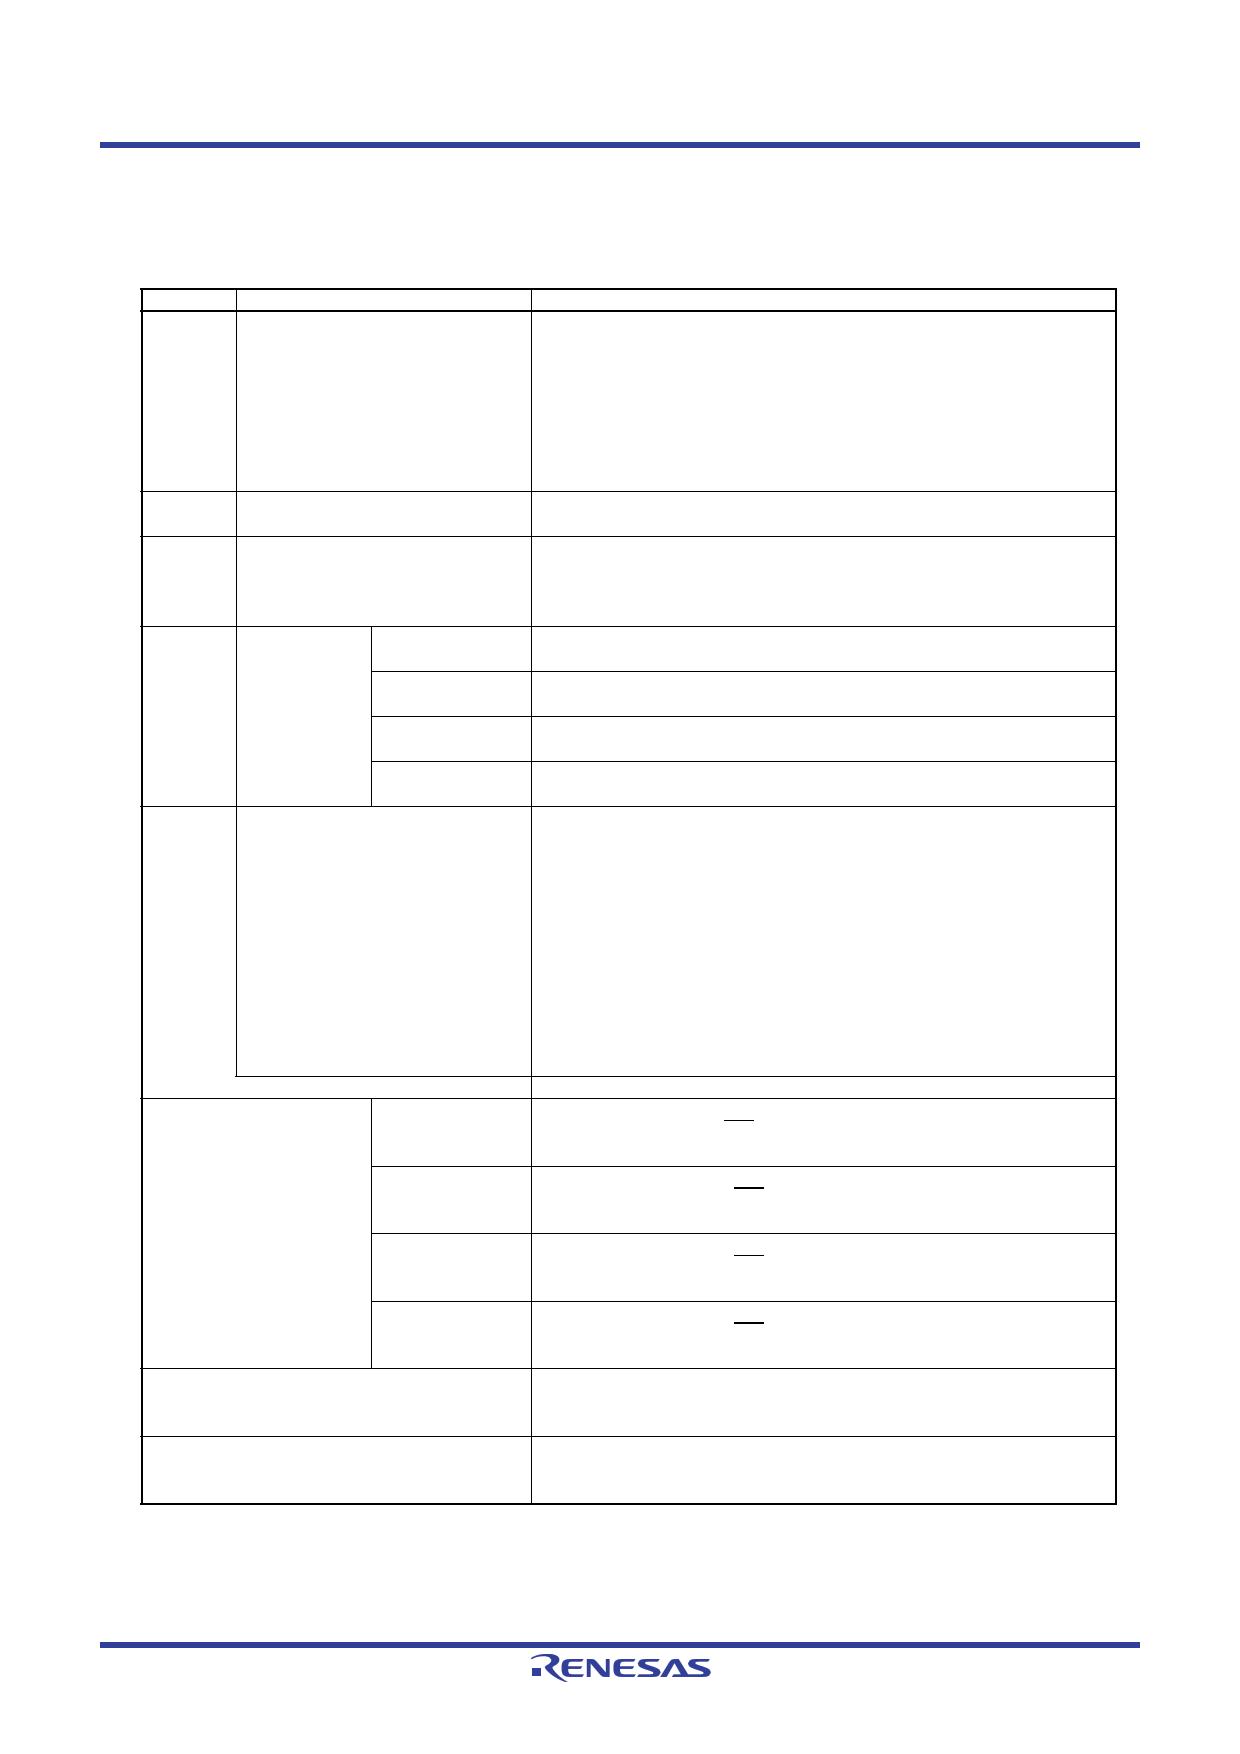 R5F2L358CDFP pdf, 반도체, 판매, 대치품